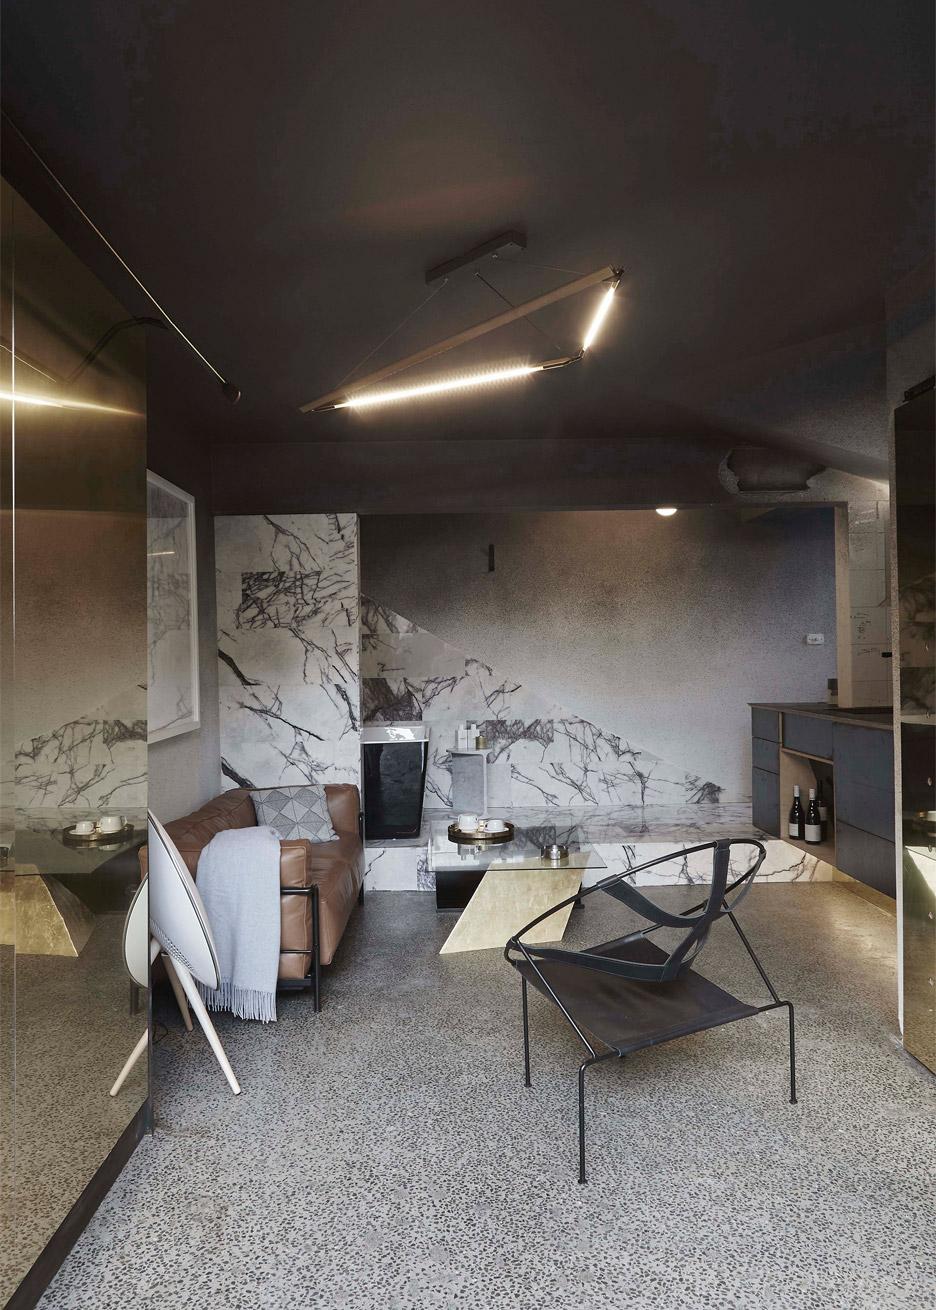 microlux-melbourne-australia-apartment-interior-design-edwards-moore_dezeen_936_3.jpg